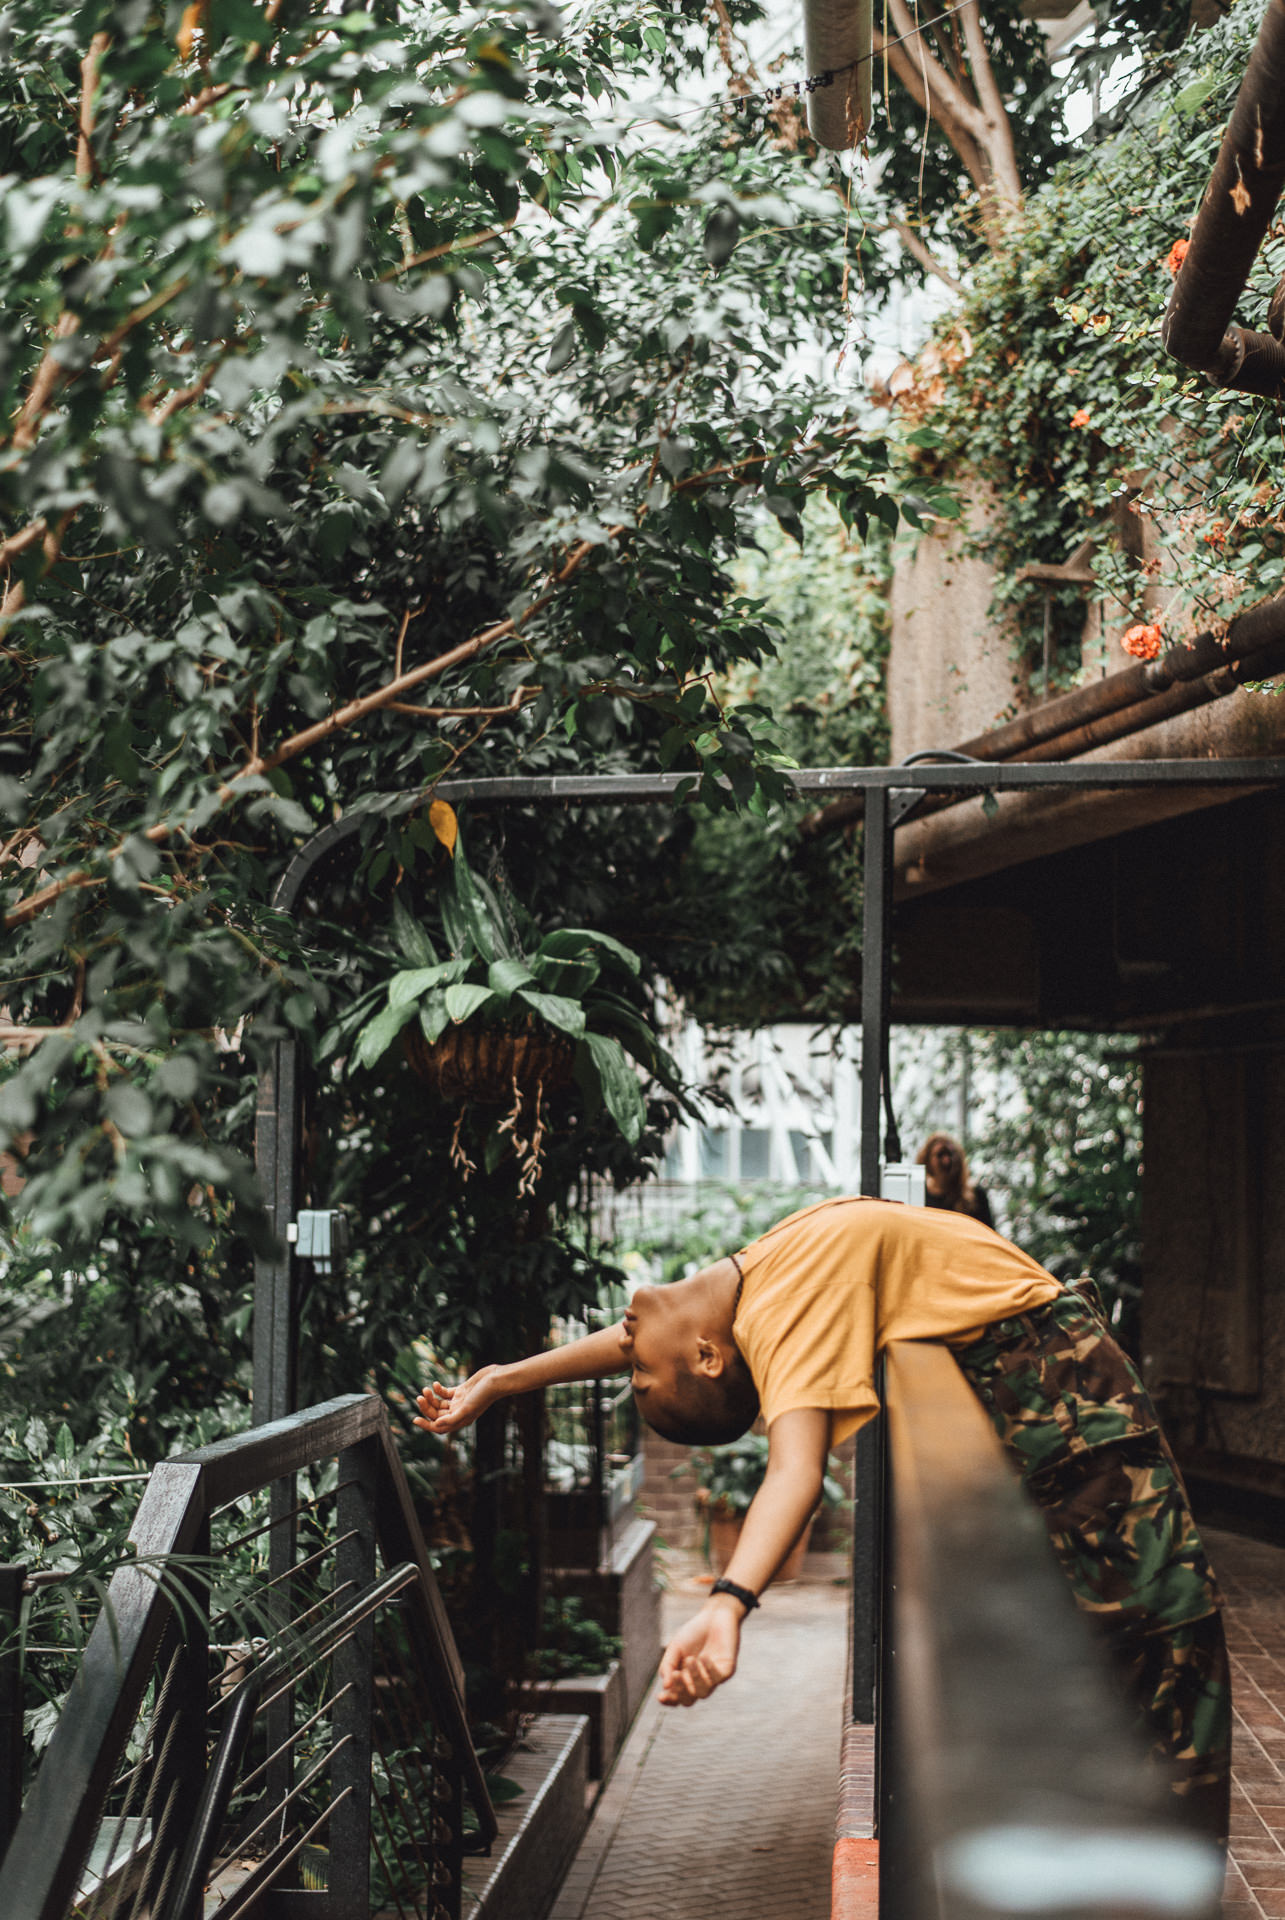 Dancer dramatically leaning over balcony - Creative london dance photography